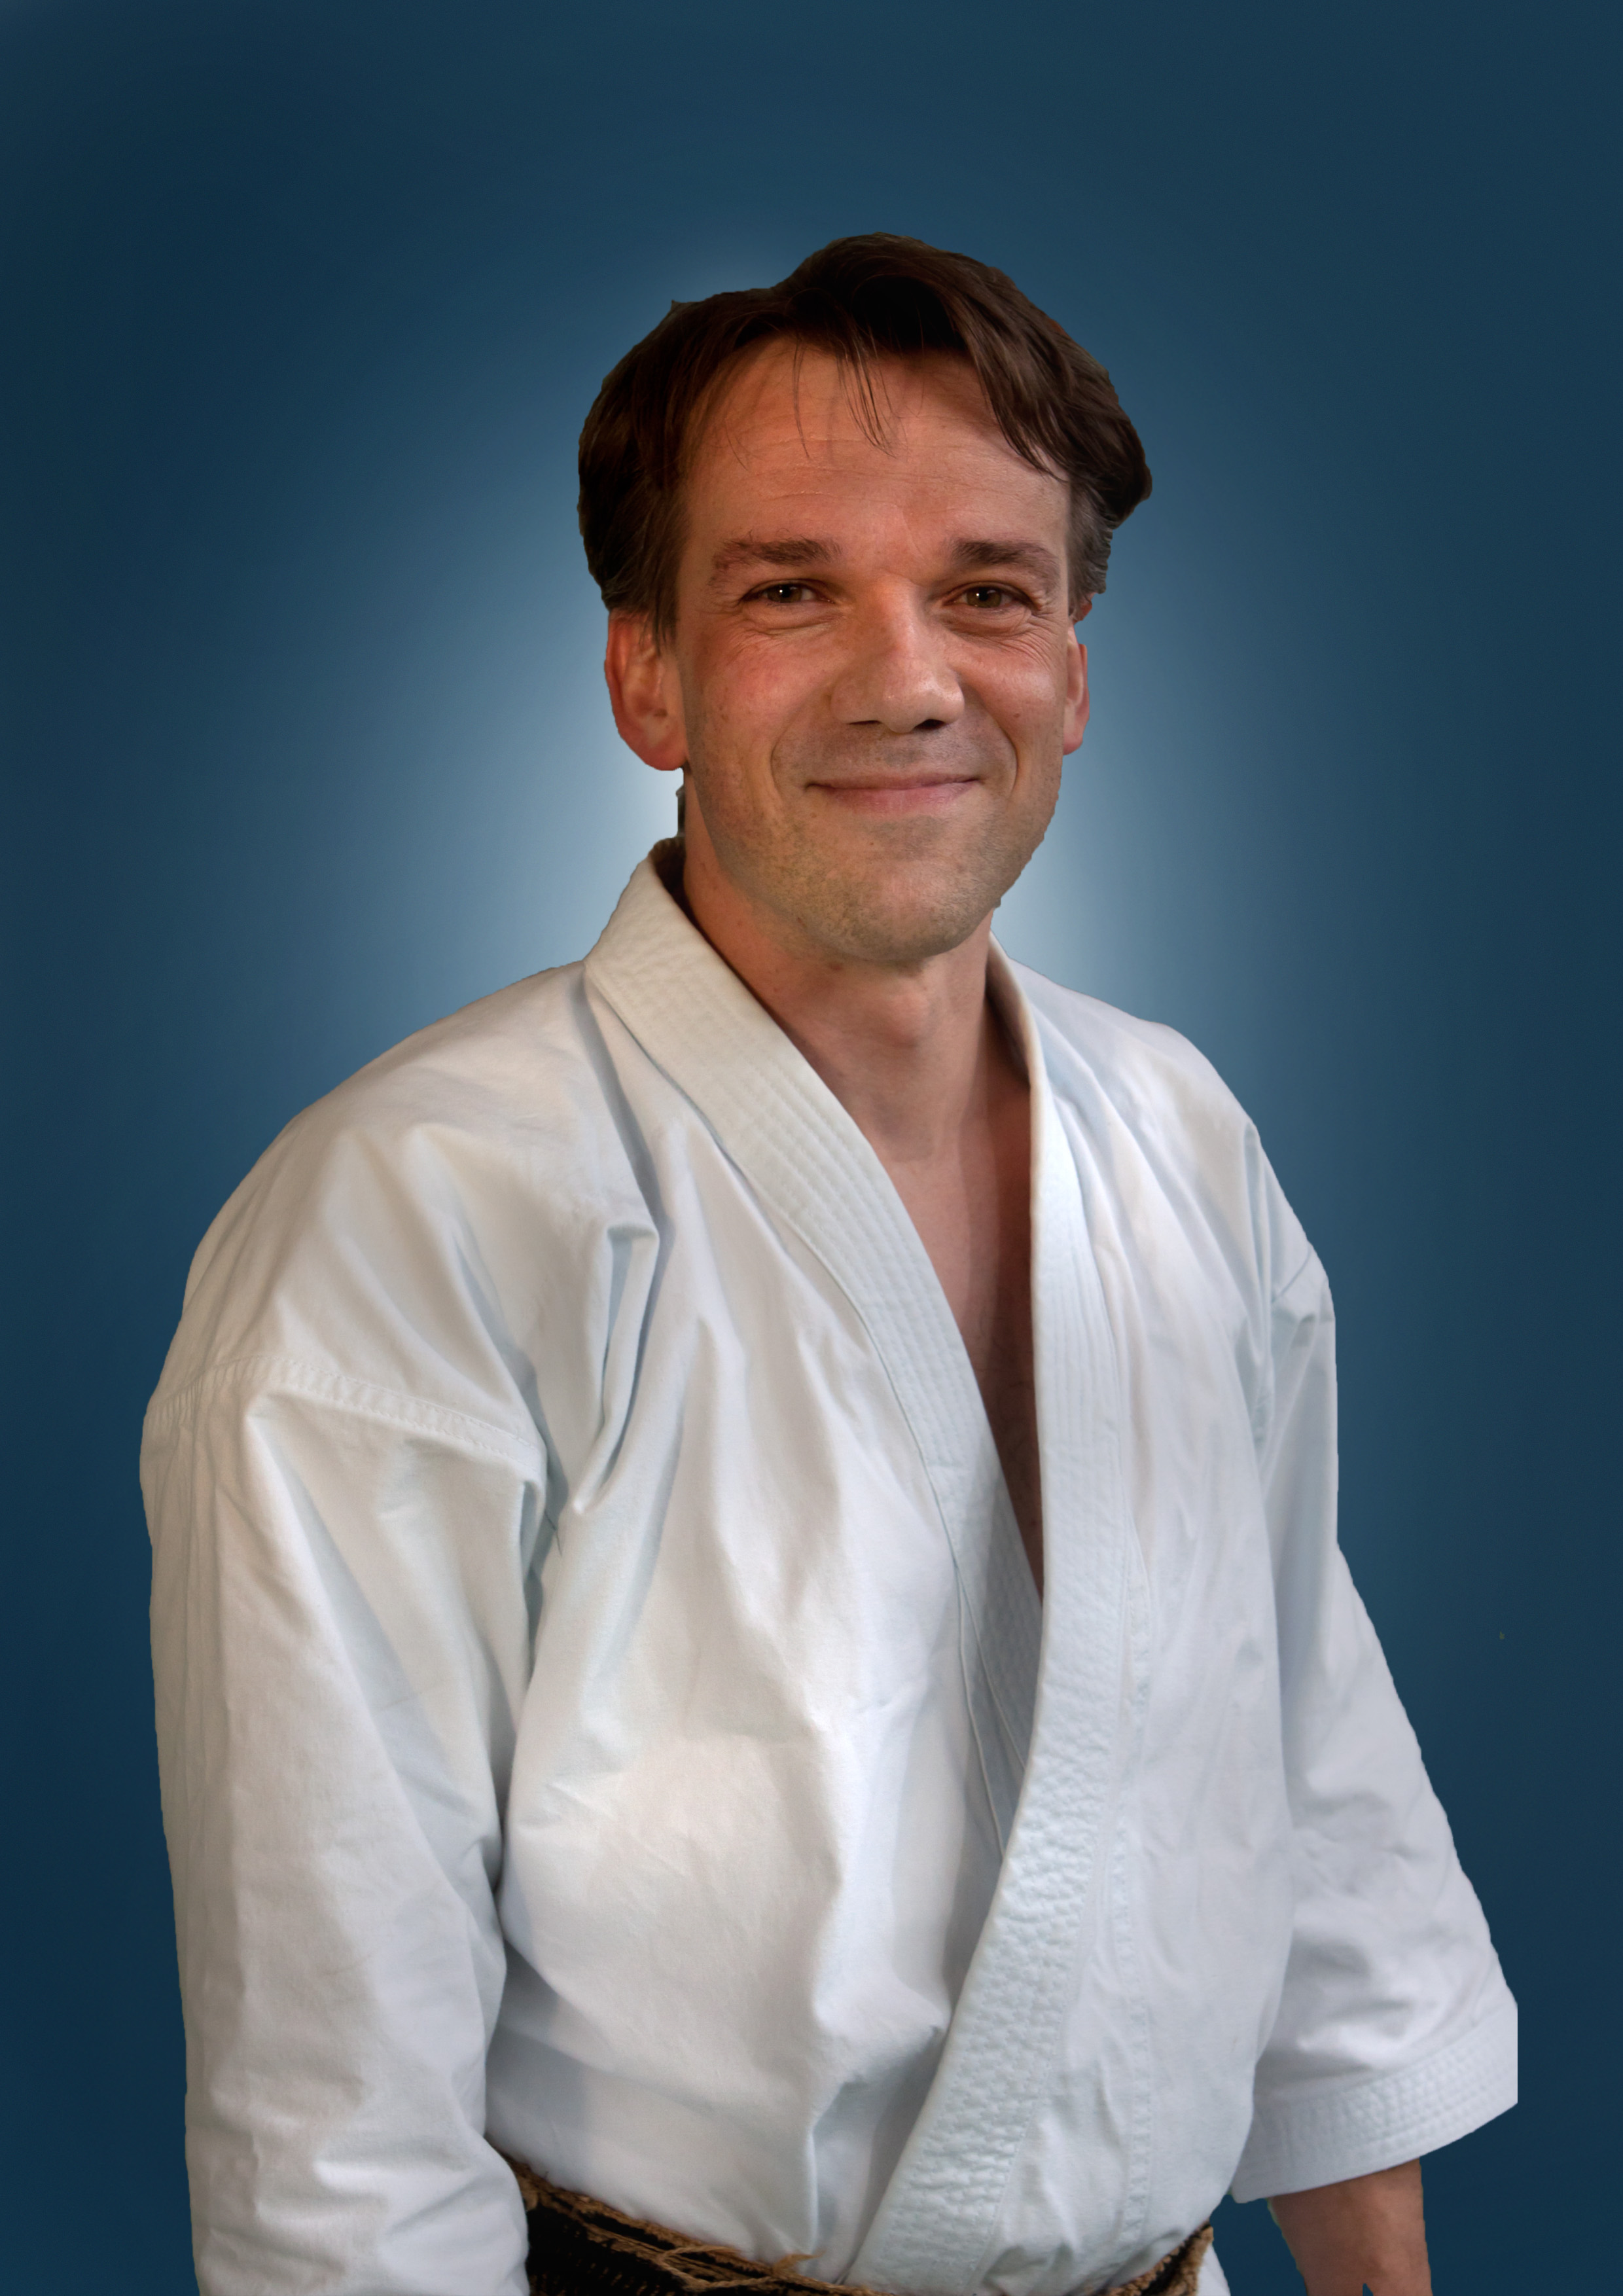 Daniel Nikmond